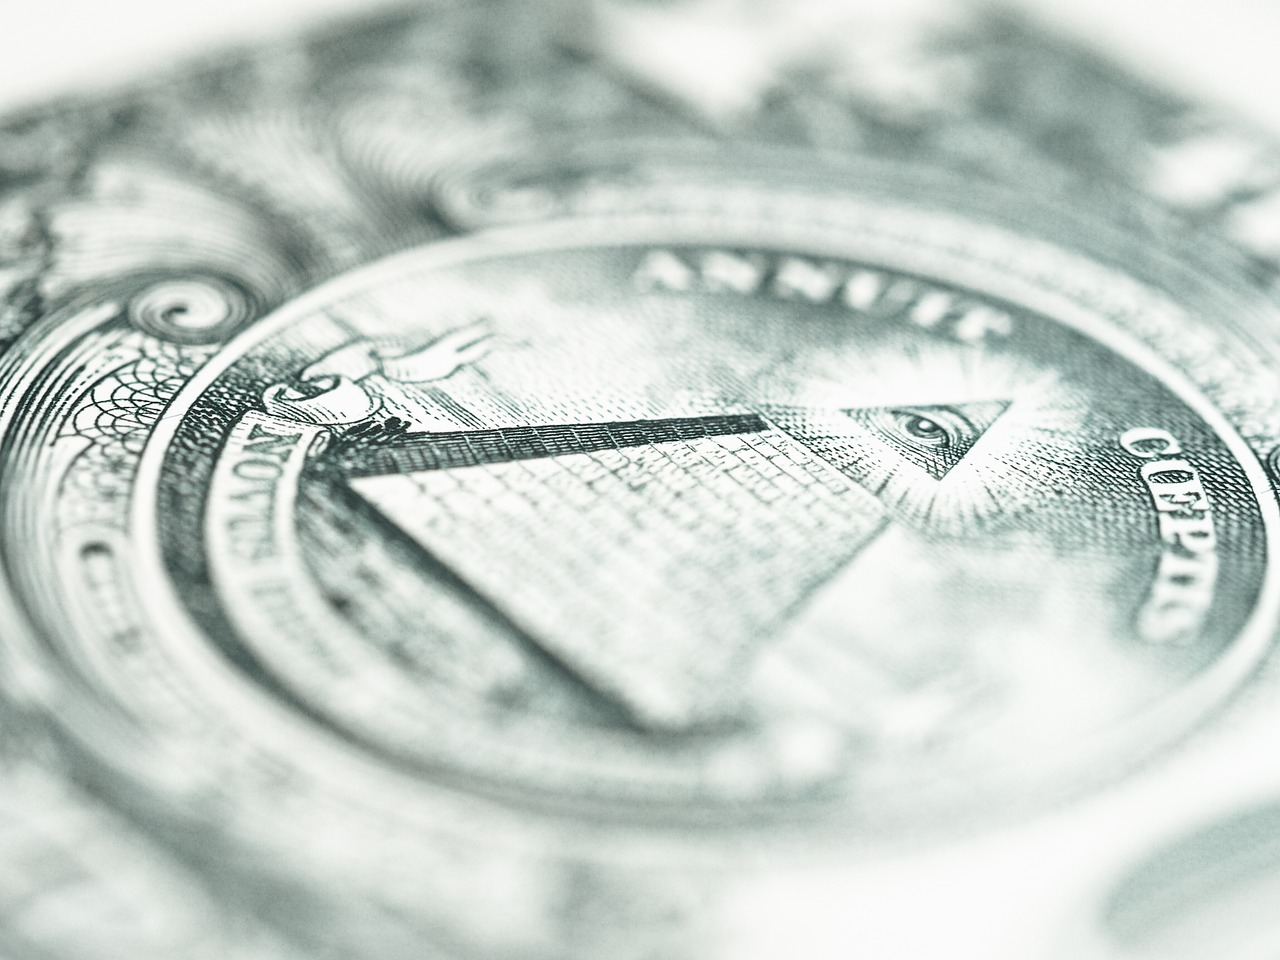 Euro dollar: wisselkoers berekenen